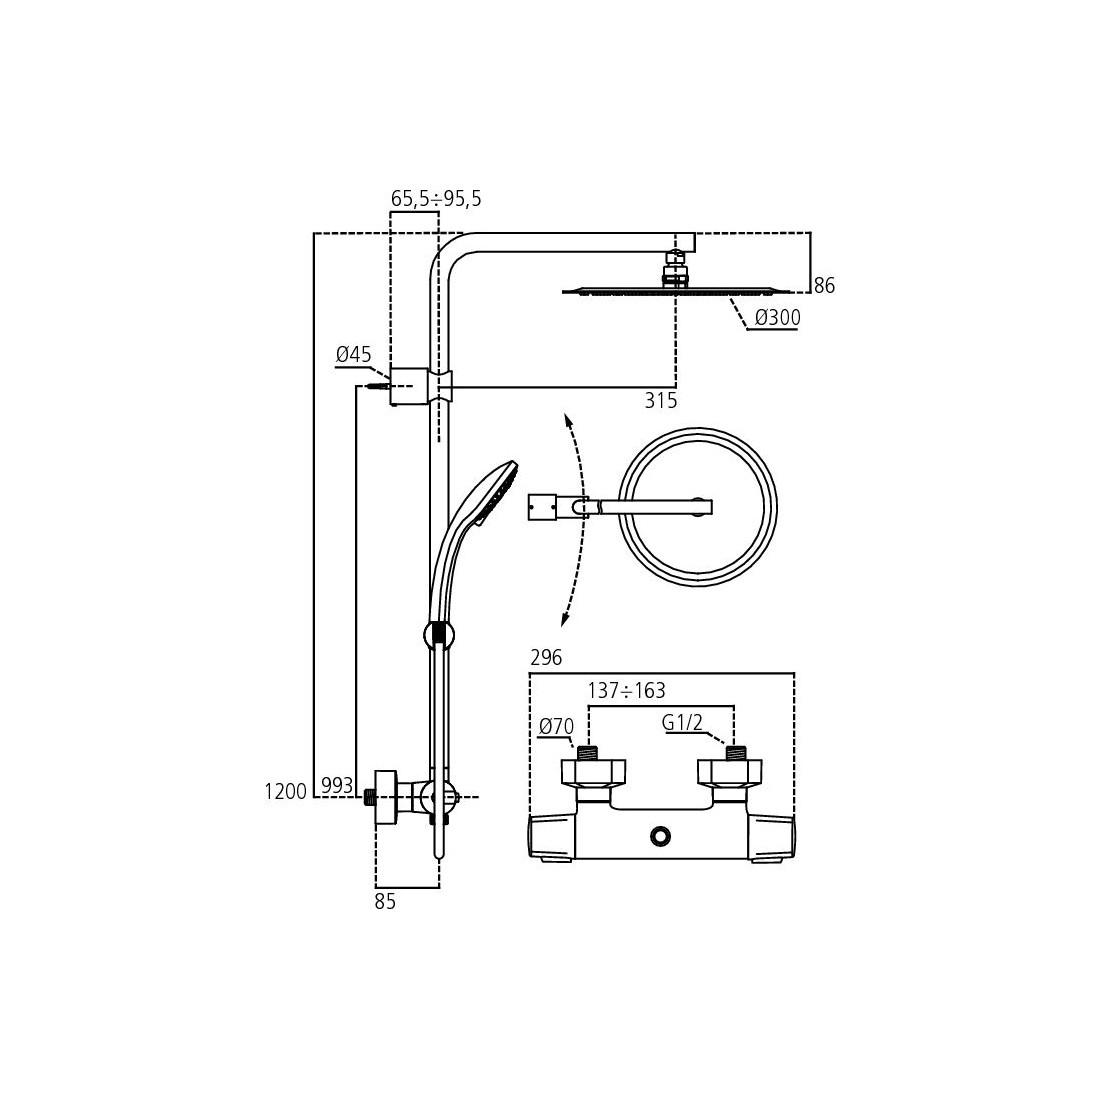 Stacionari dušo sistema Ideal Standard, IdealRain Lux, su termostatiniu maišytuvu